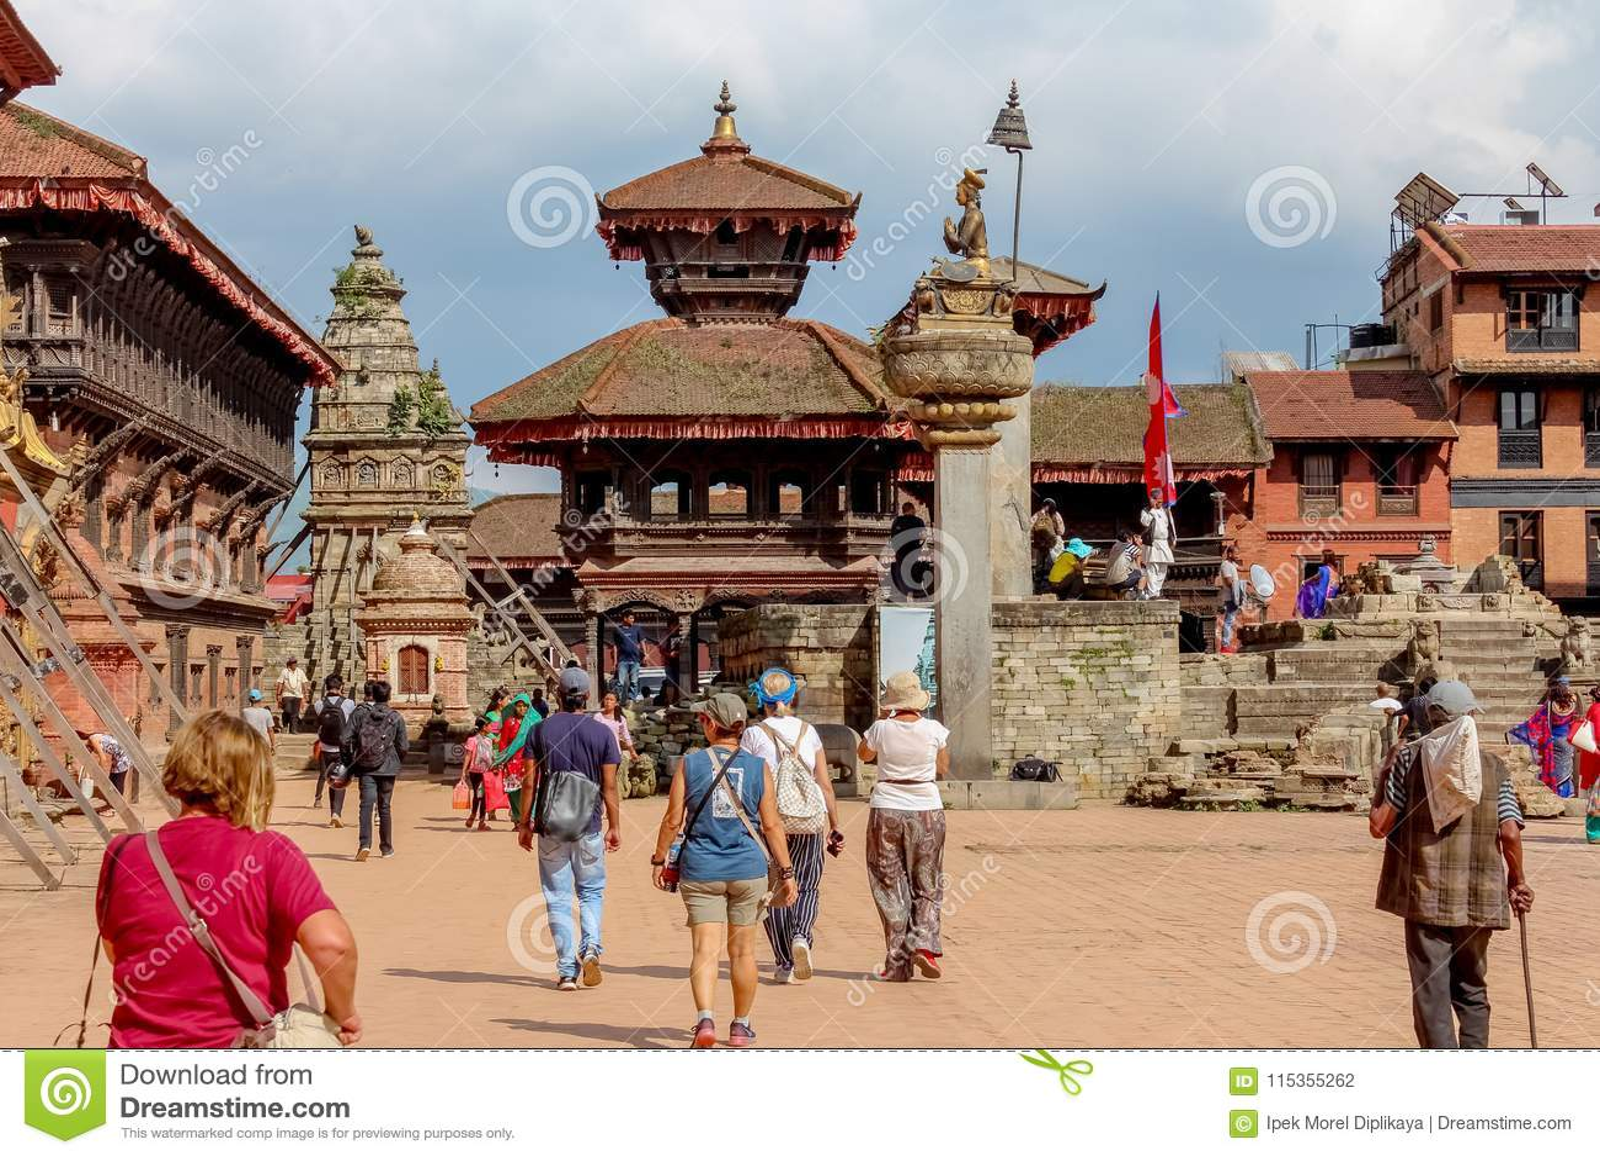 Kathmandu, Nepal - November 04, 2016: Nepalese people and tourists in Durbar Square, Kathmandu, Nepal